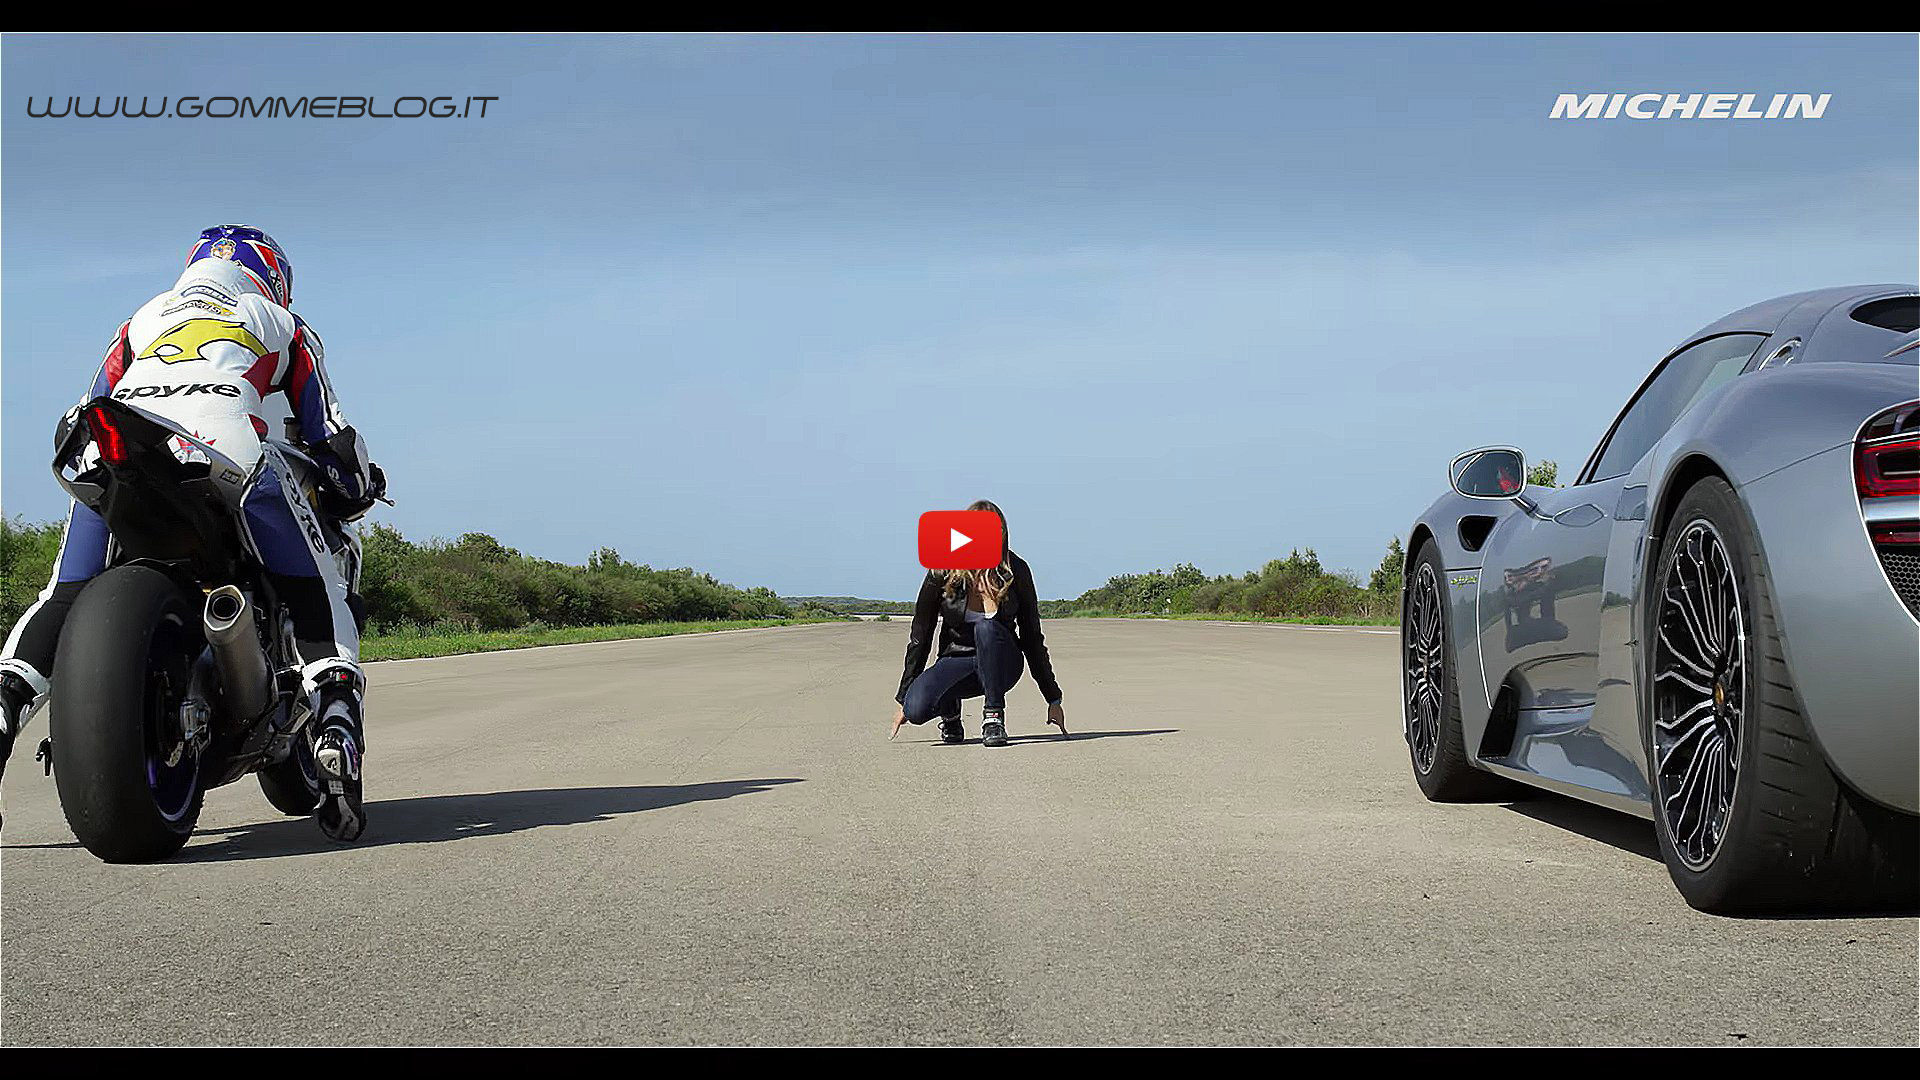 Porsche 918 Spyder VS Yamaha YZF R1 - VIDEO - Michelin #WeAreAllRacers 2